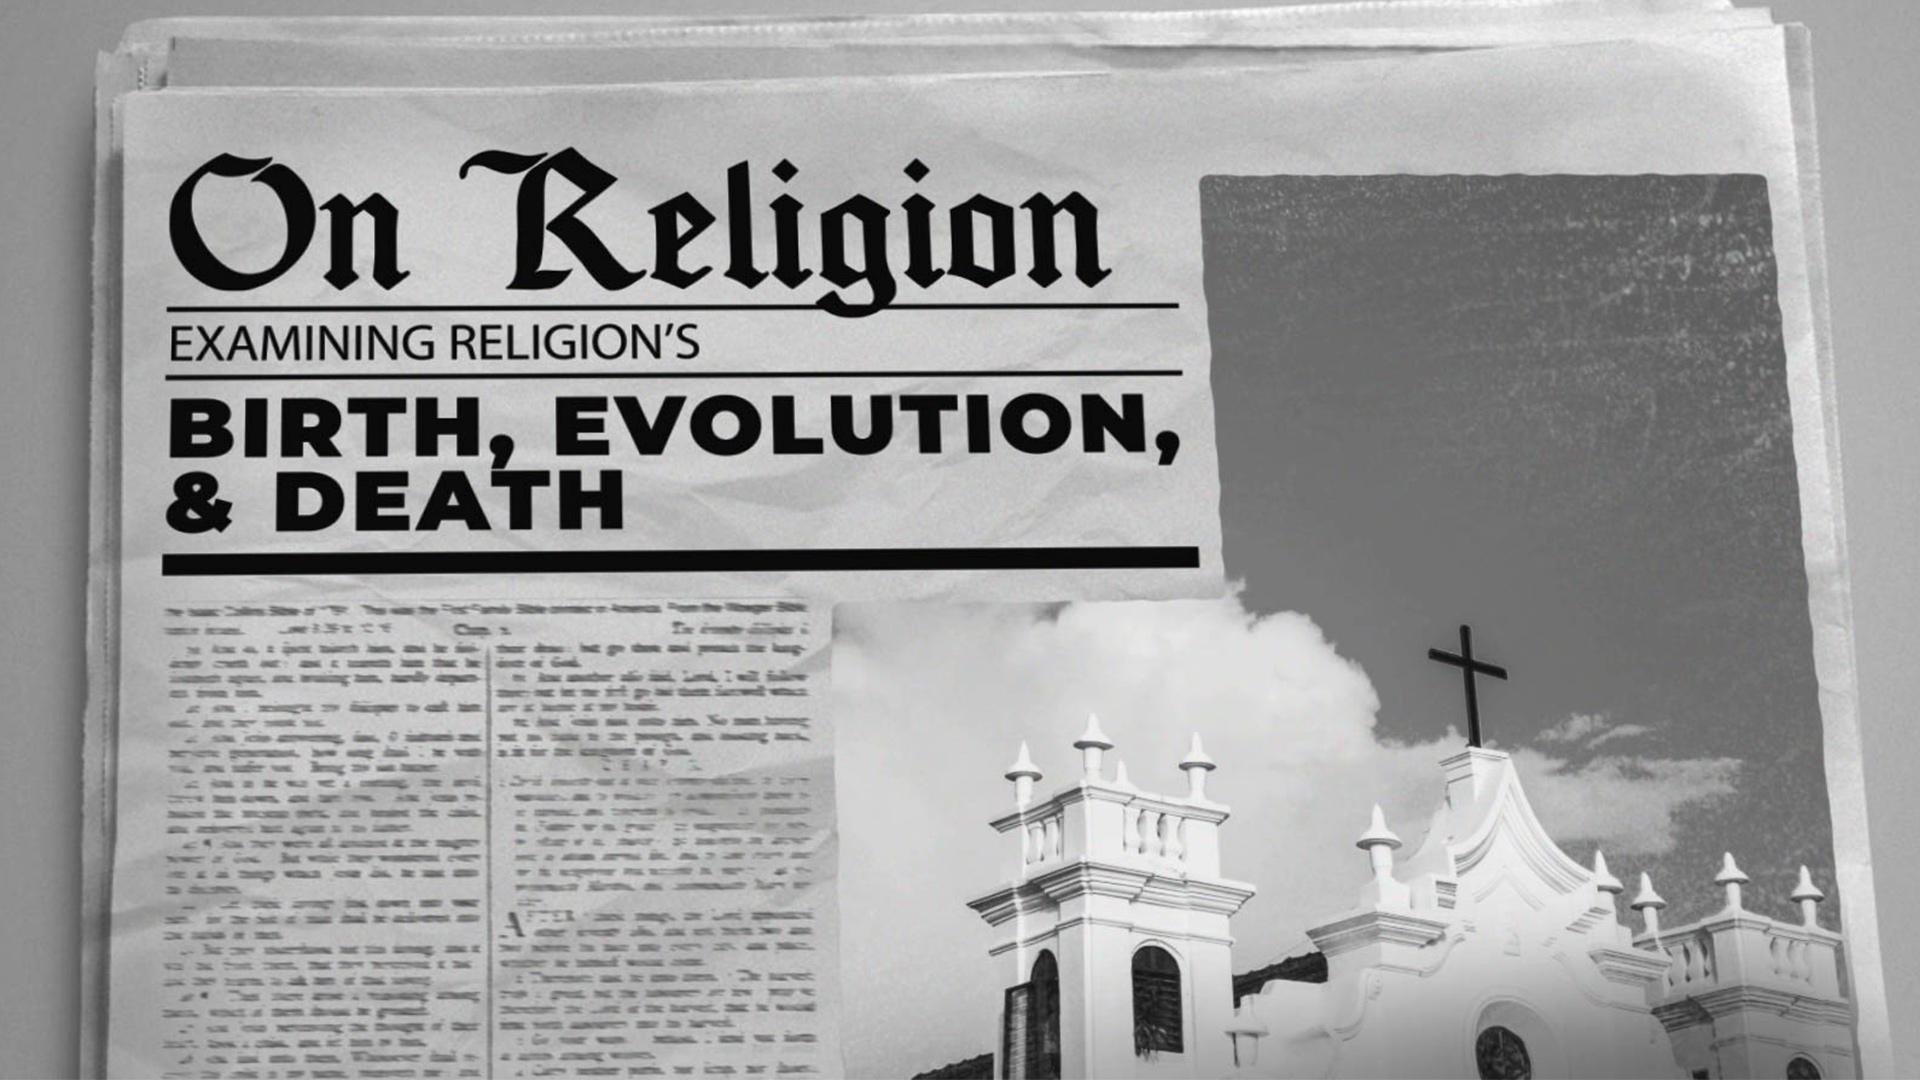 On Religion.jpg